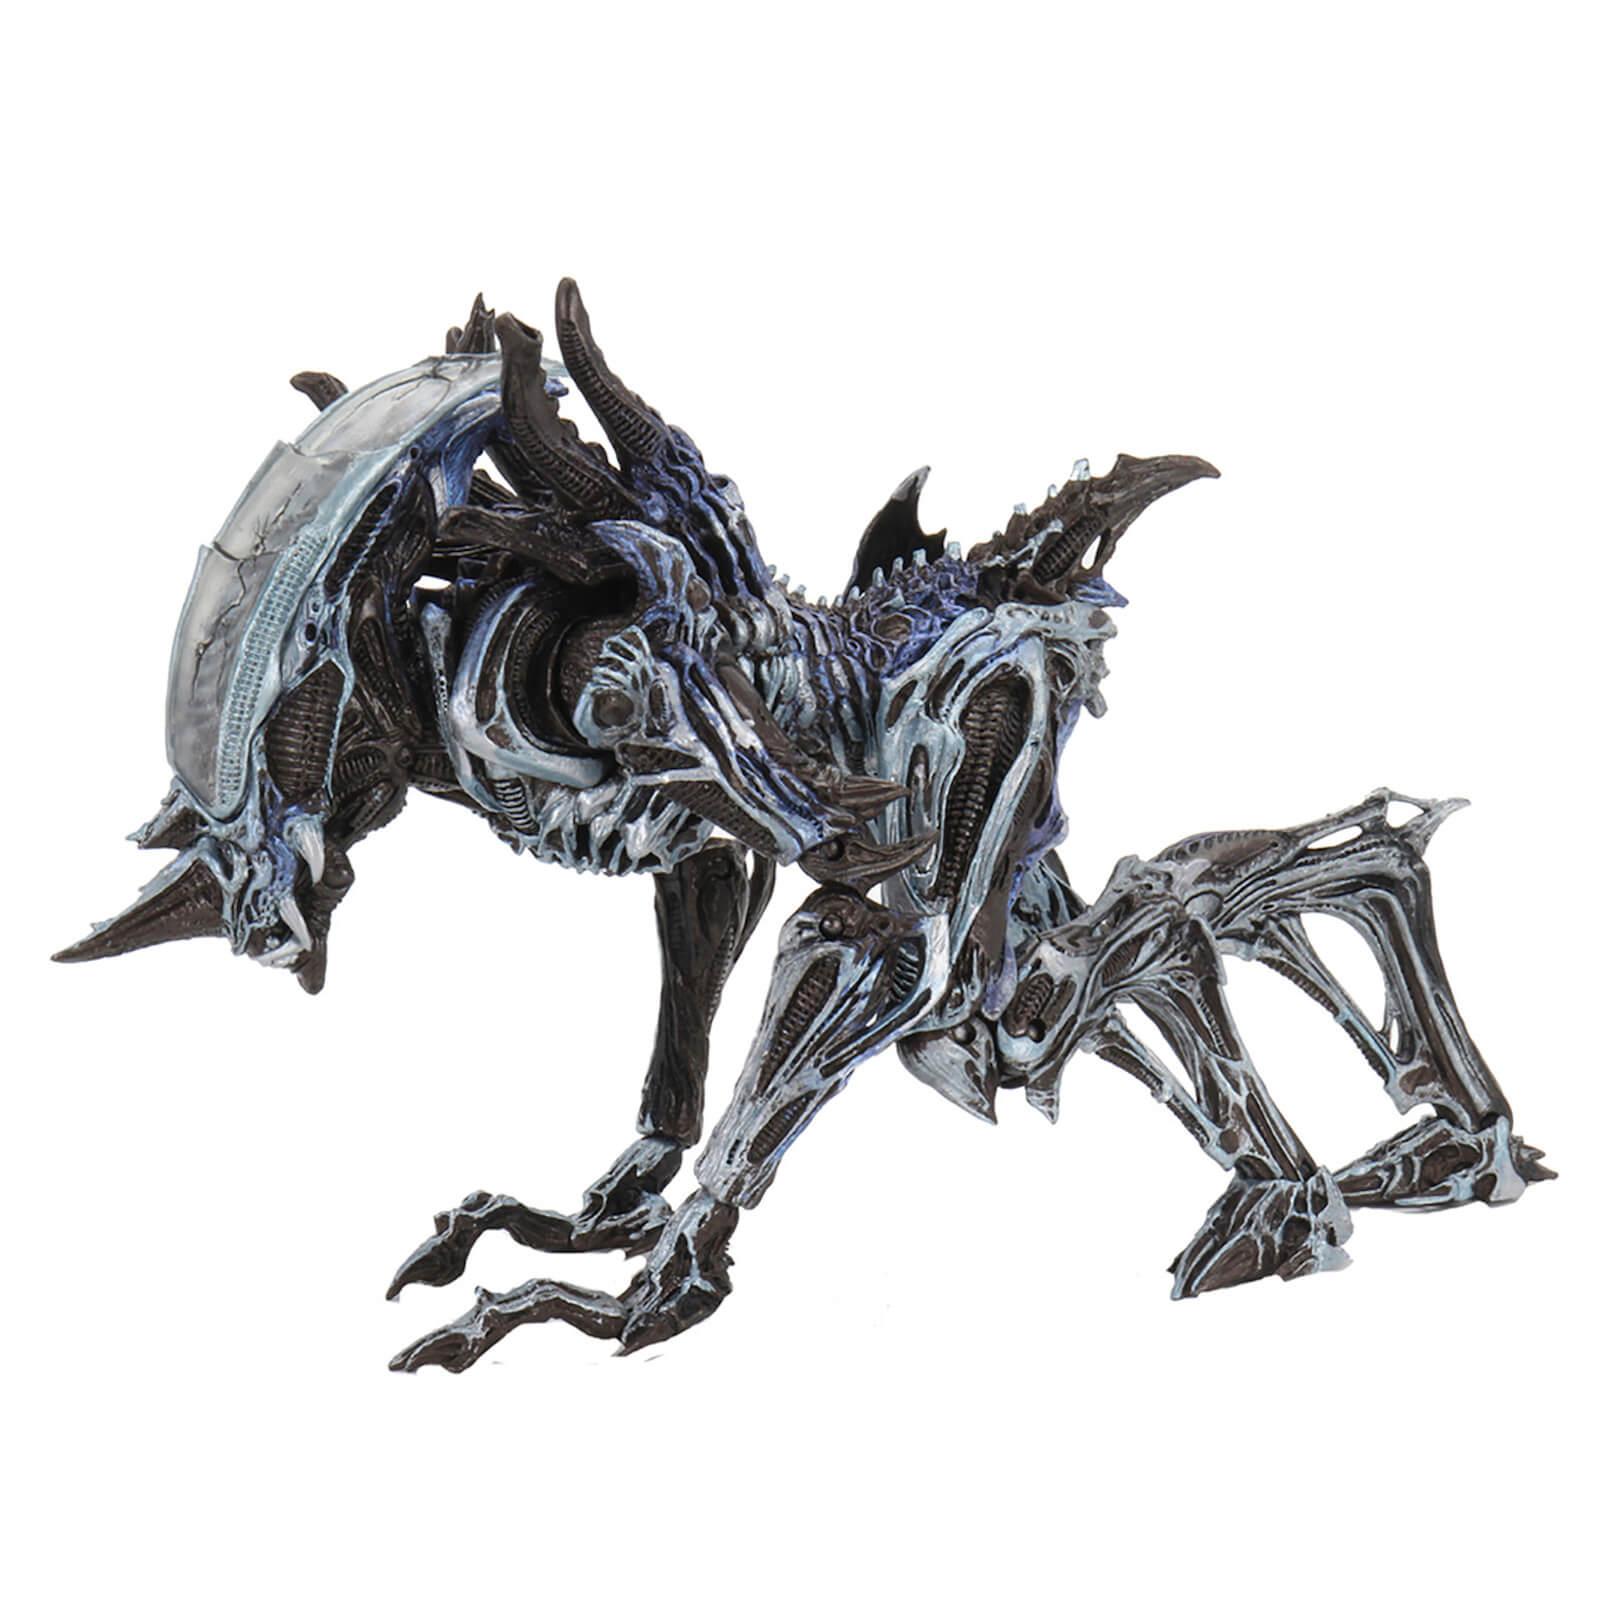 NECA Alien Ultimate Rhino Alien Version 2 (Kenner Tribute) 7 Inch Scale Action Figure